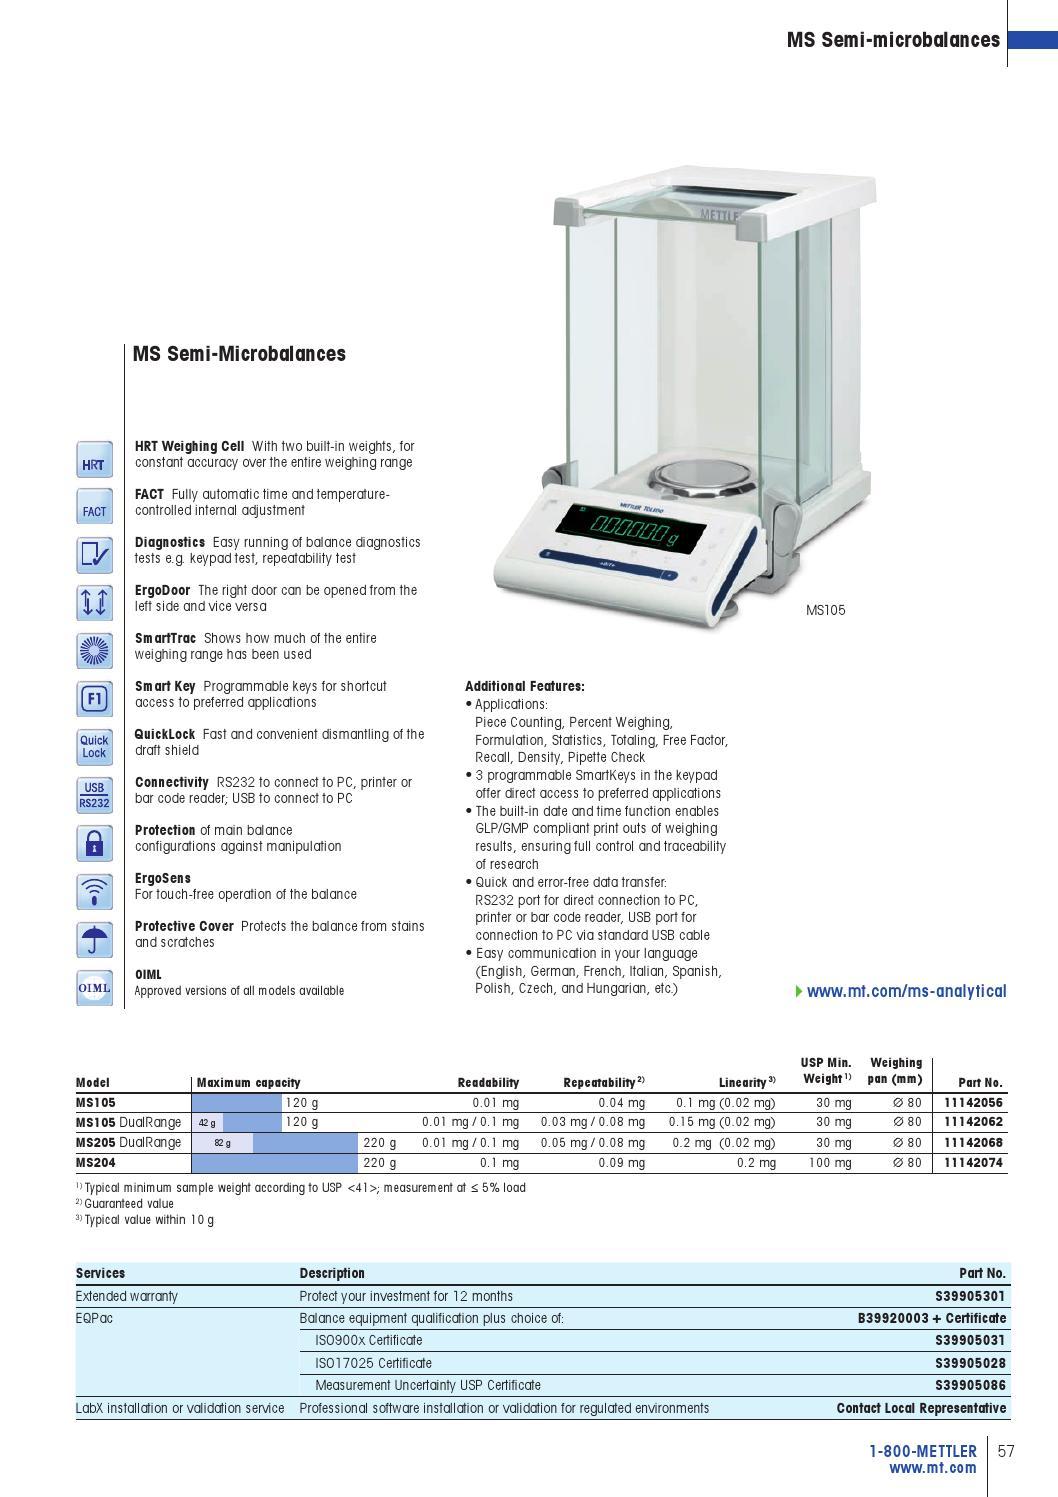 METTLER TOLEDO Laboratory Catalog by Bill Packman - issuu